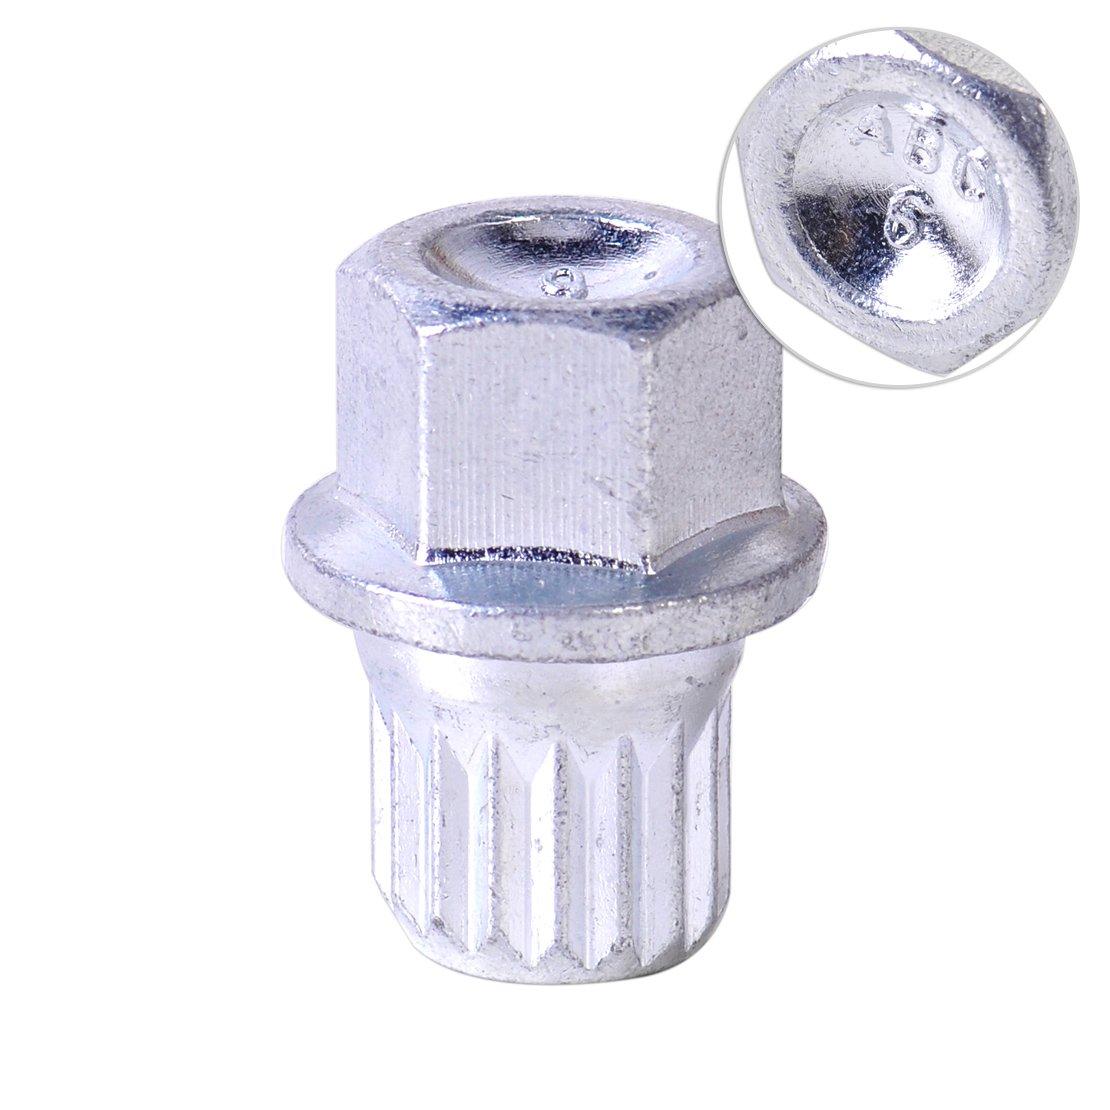 beler 17mm Antitheft Wheel Bolt Lock Nut Cap 8D0601139F 8D0 601 139F 006 Fit for VW Golf Jetta Beetle Passat Audi (Fulfilled by hermeshine) by beler (Image #5)